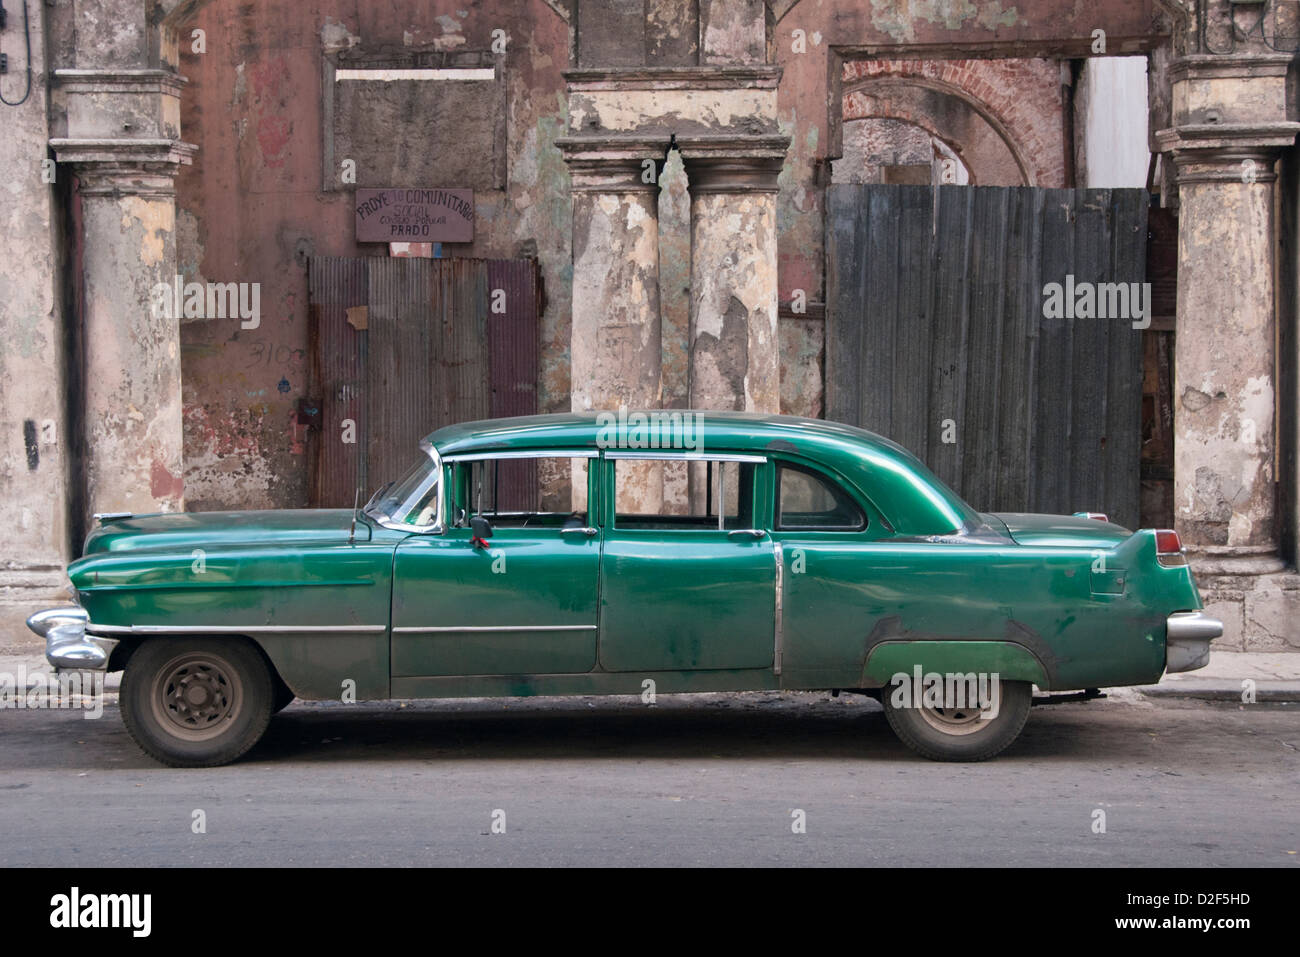 Old American 1950s Classic Car in front of Dilapidated Buildings, Paseo del Prado, Centro Habana, Havana, Cuba - Stock Image